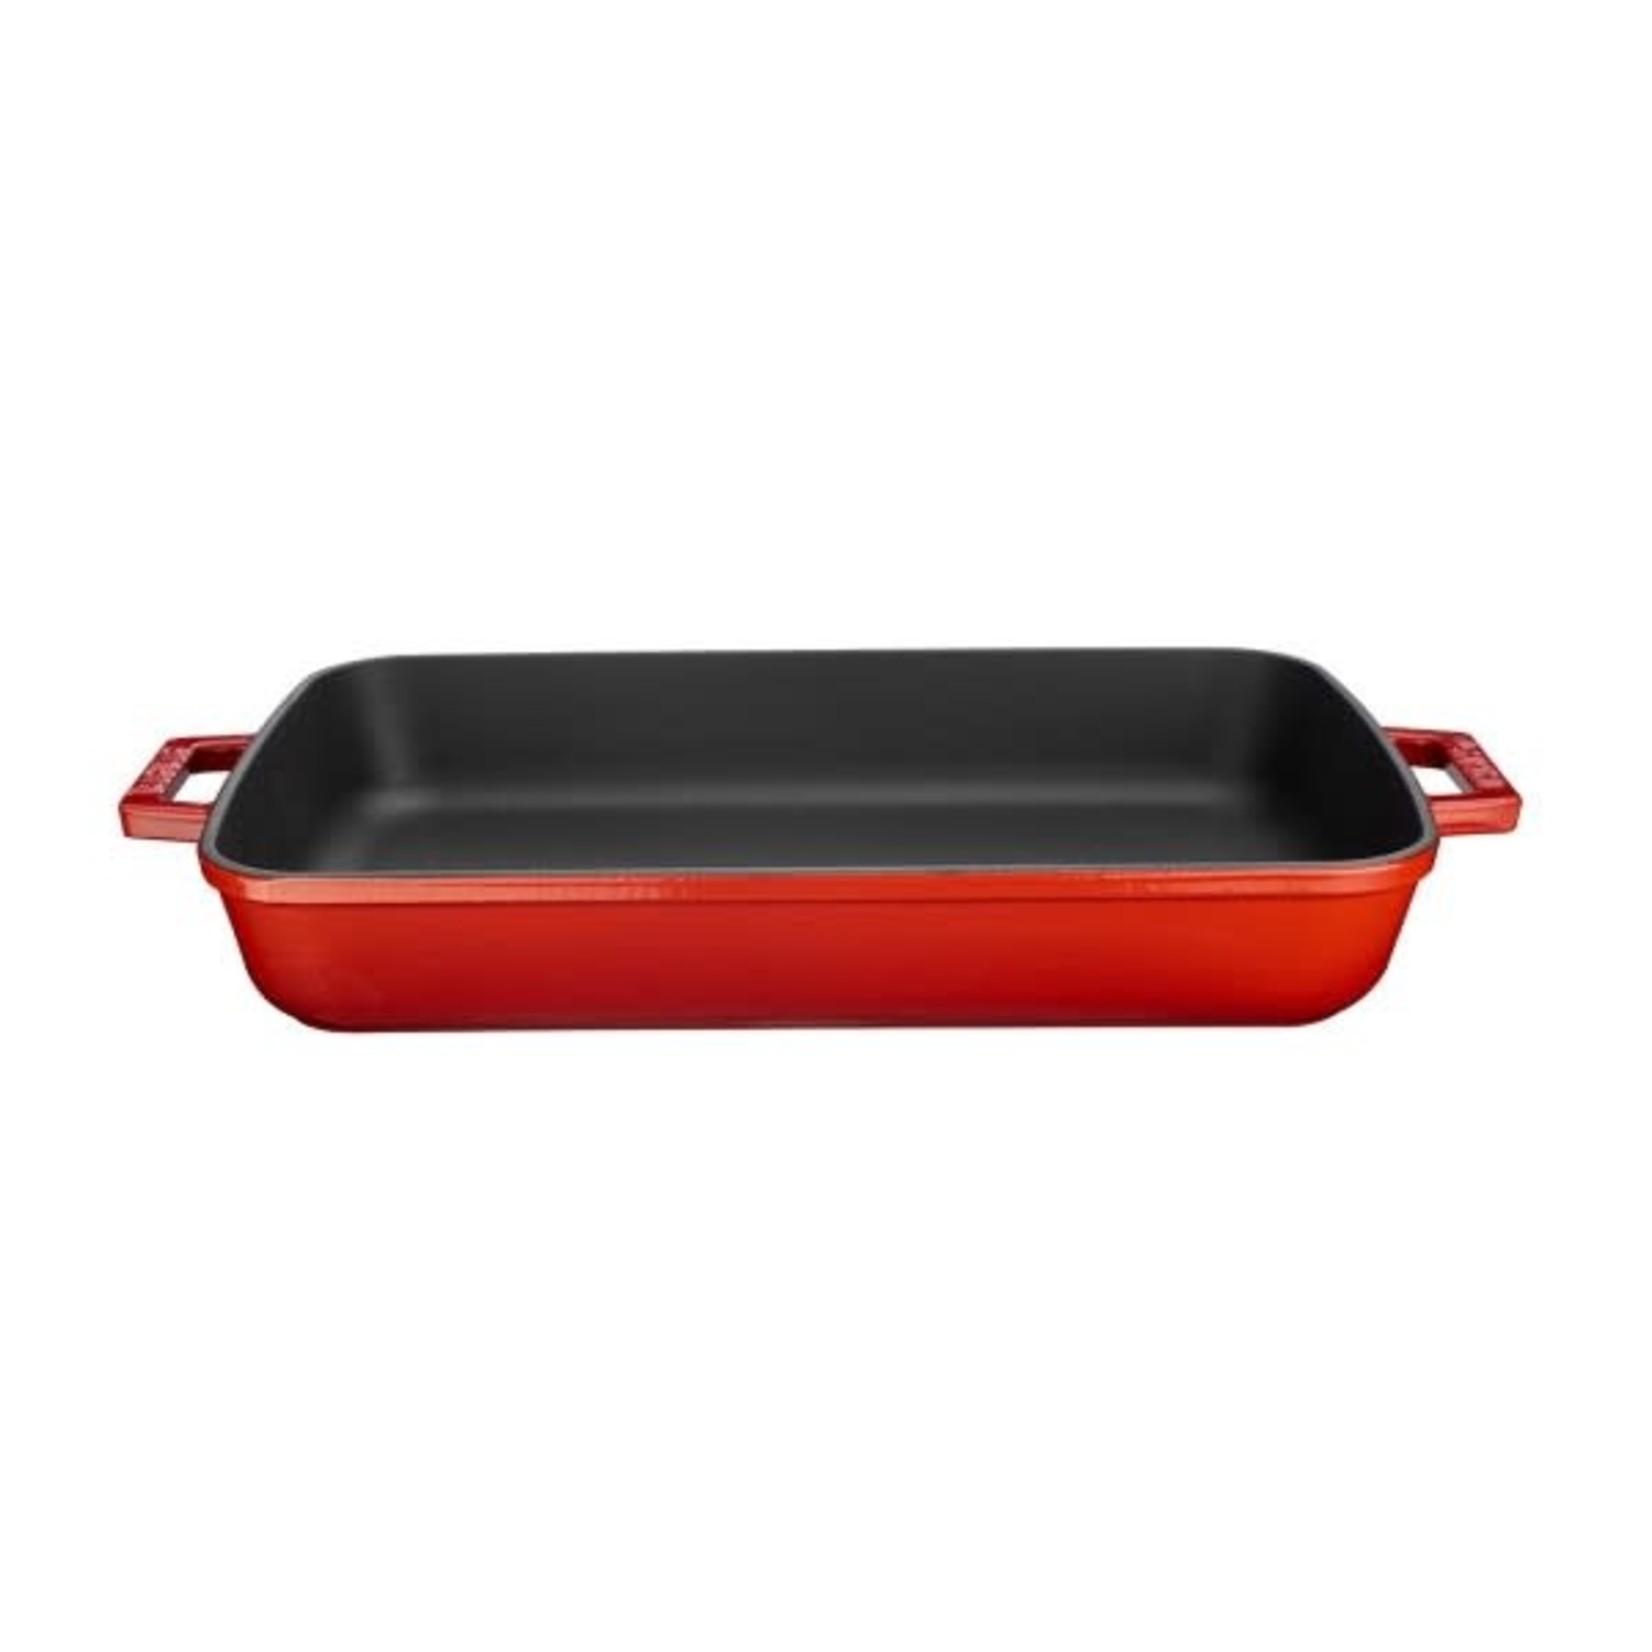 Lava Gietijzeren braadslede 22x30cm rood